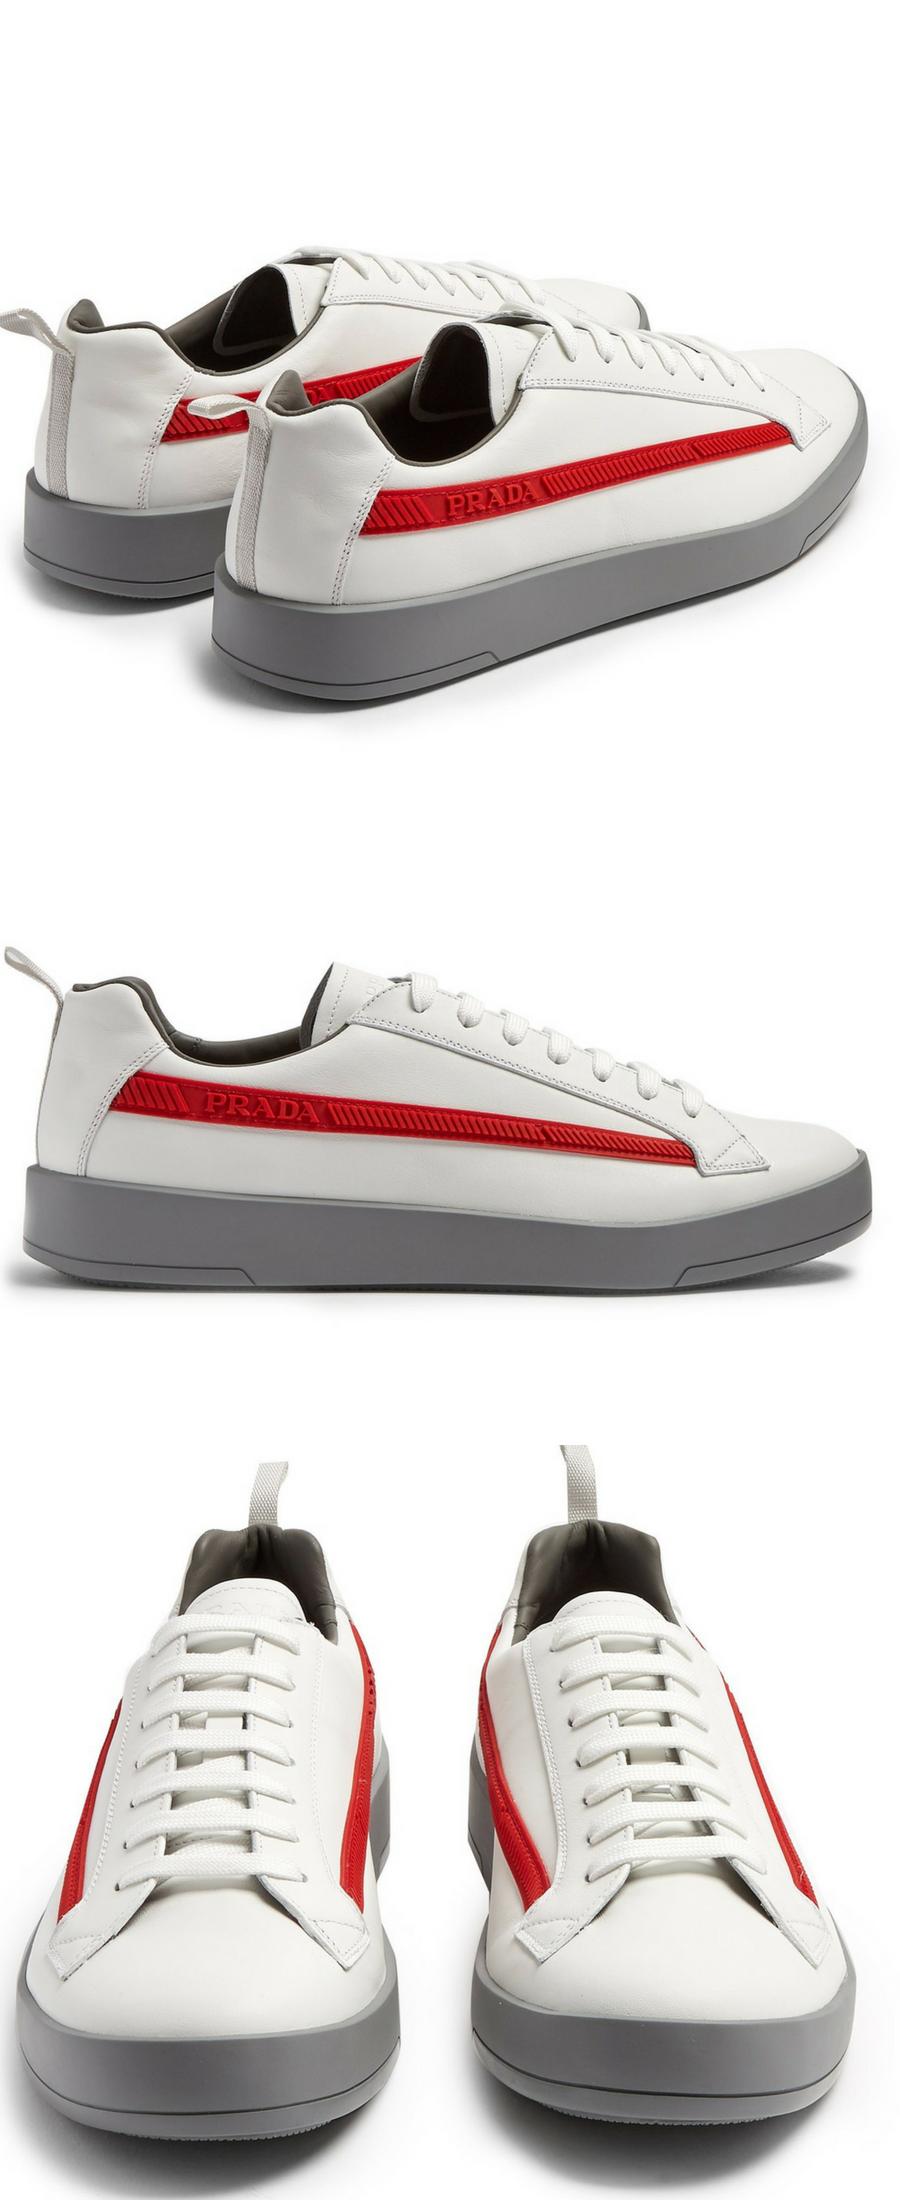 white leather Prada trainers